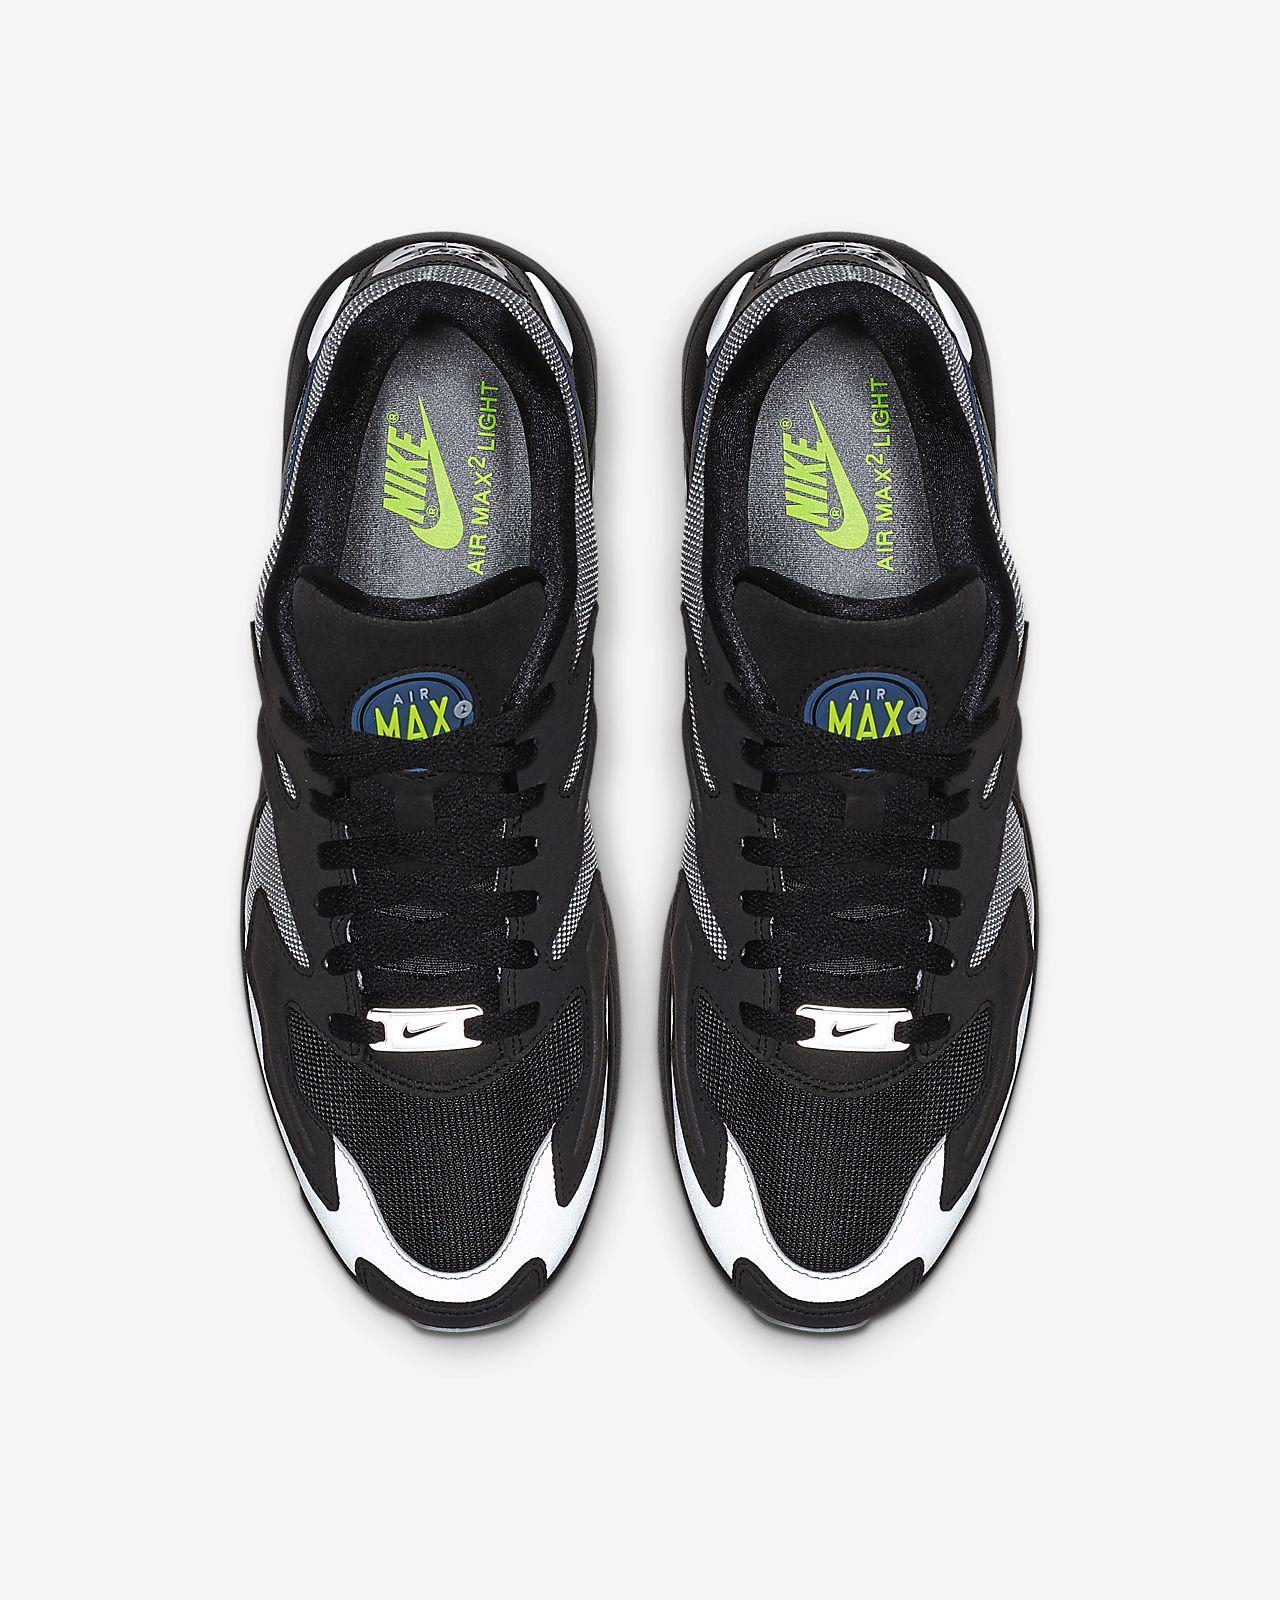 8002542a Мужские кроссовки Nike Air Max2 Light. Nike.com RU